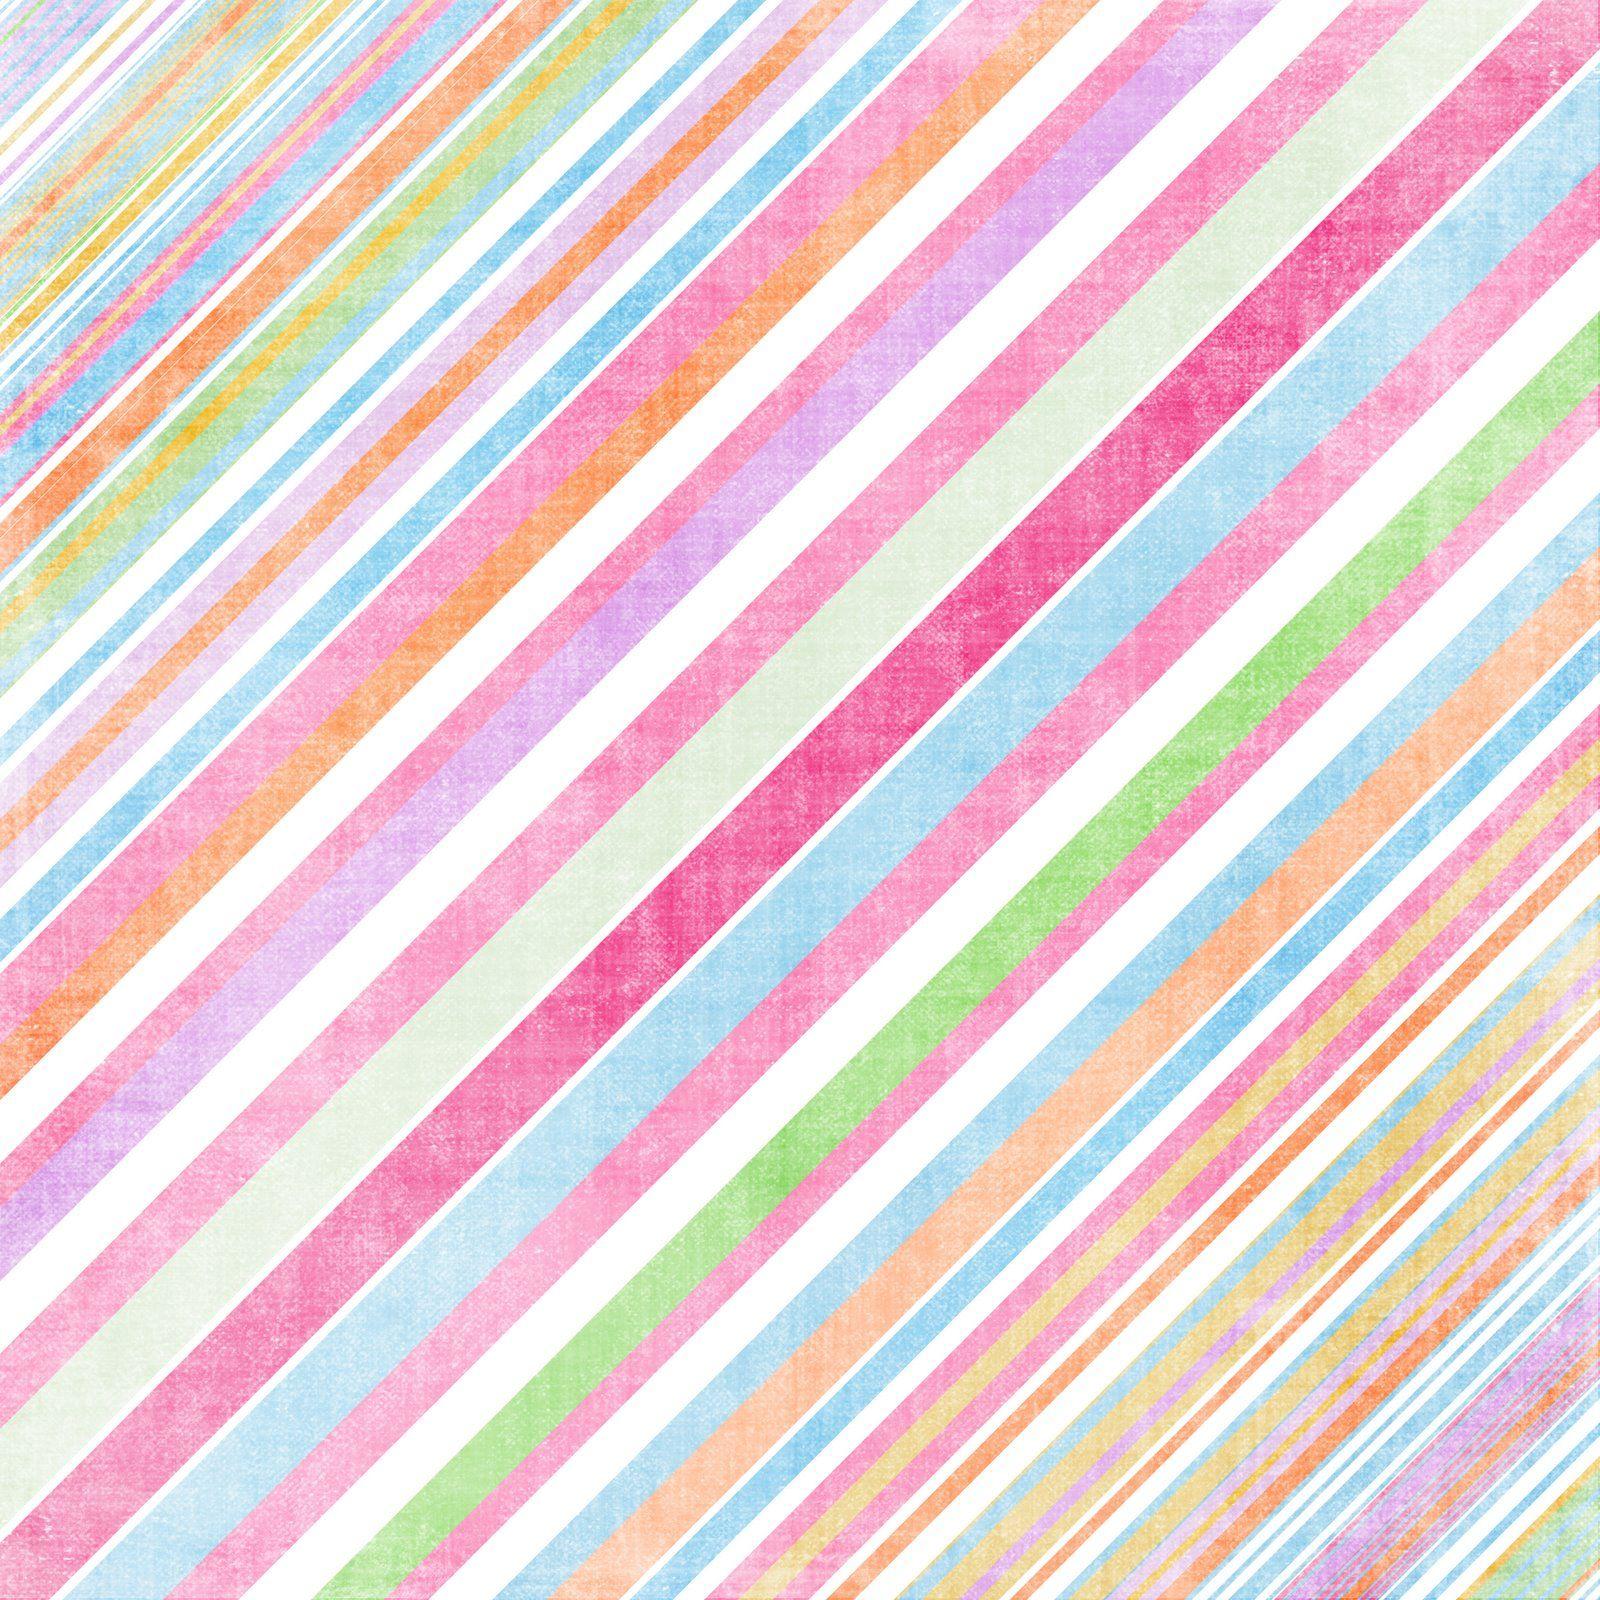 Diagonal rainbow stripe pattern | Kawaii ♡ Patterns ...